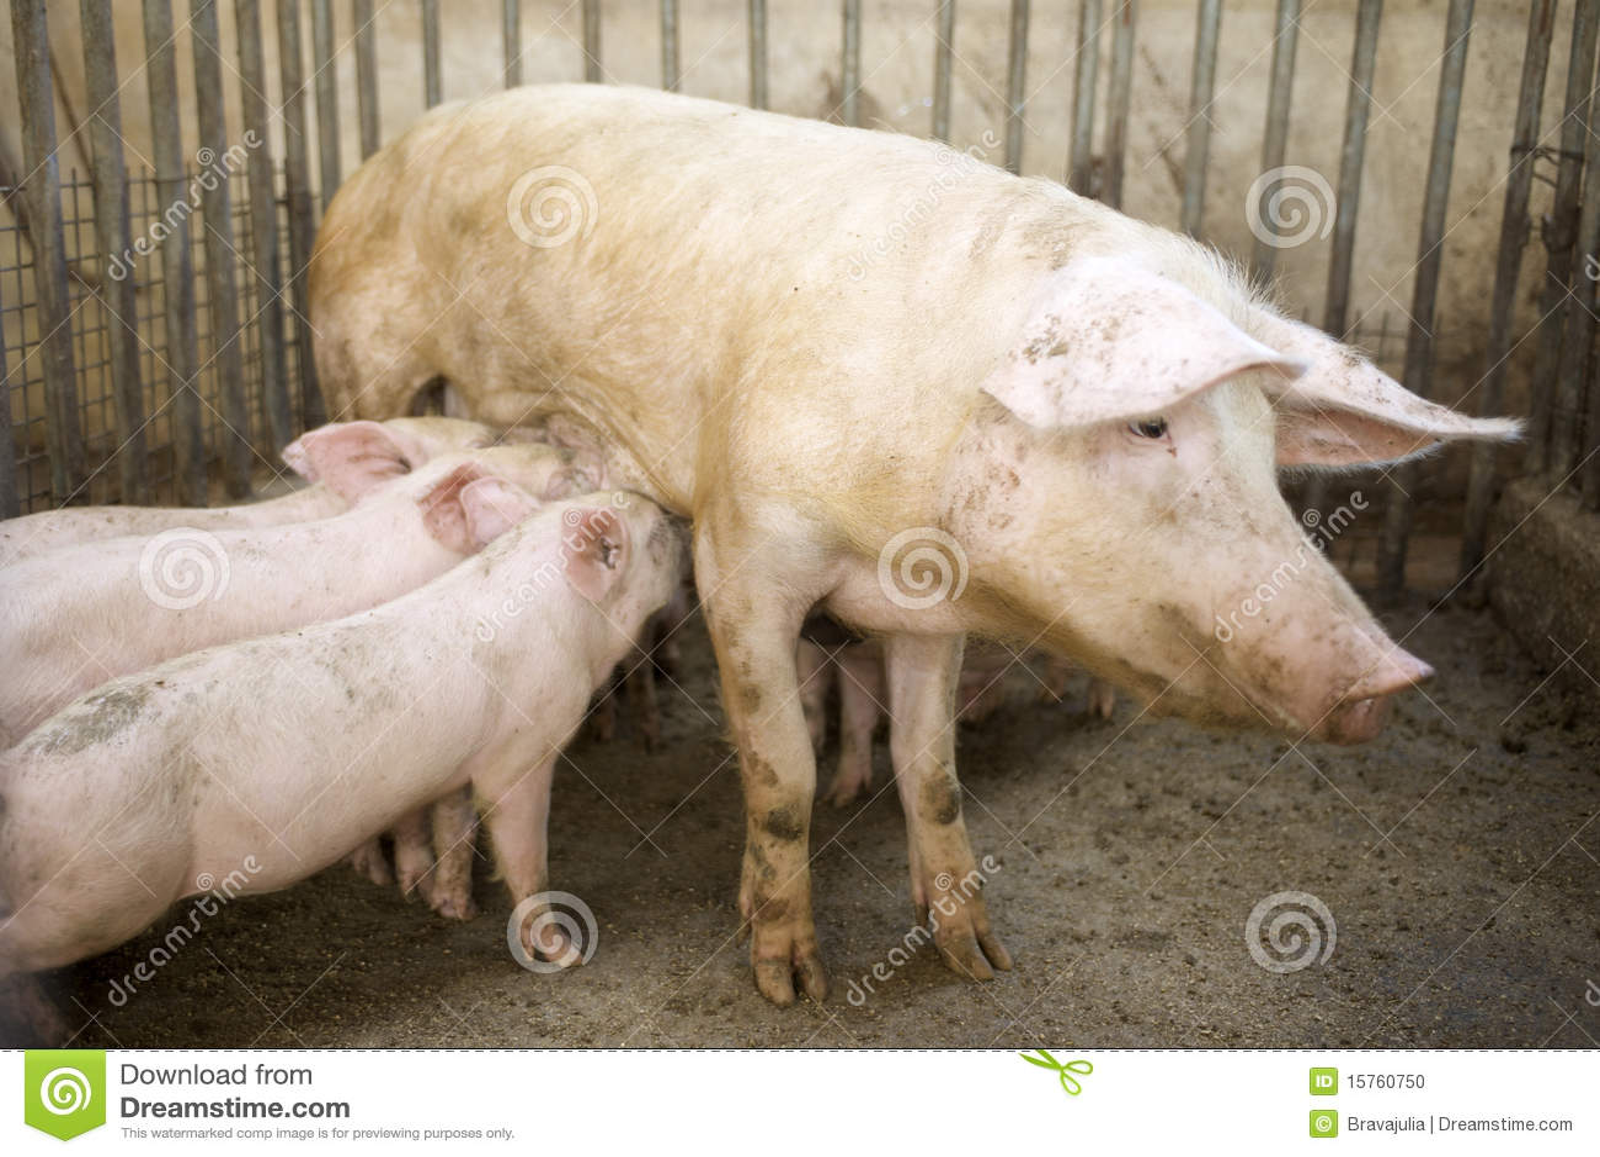 Pig Feeding Her Piglets Stock Photo Image 15760750